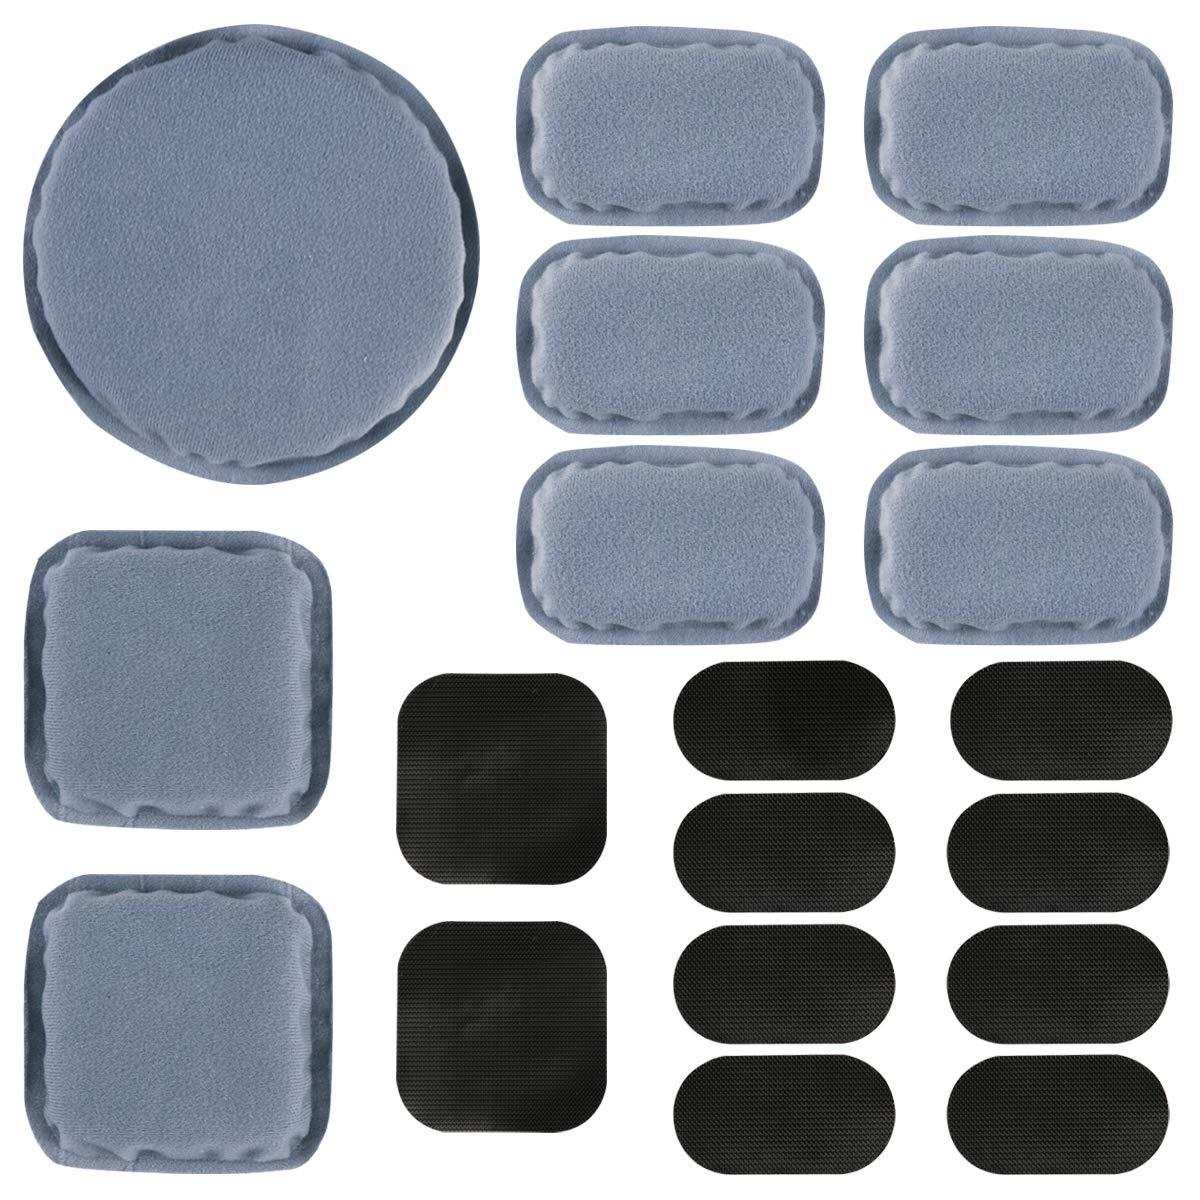 Set Casco Kits de Relleno de Espuma de Repuesto Set Accesorios Alfombrillas para Casco Fast//Mich//ACH//USMC//PASGT 19pcs Aoutacc Universal Airsoft Casco Pads